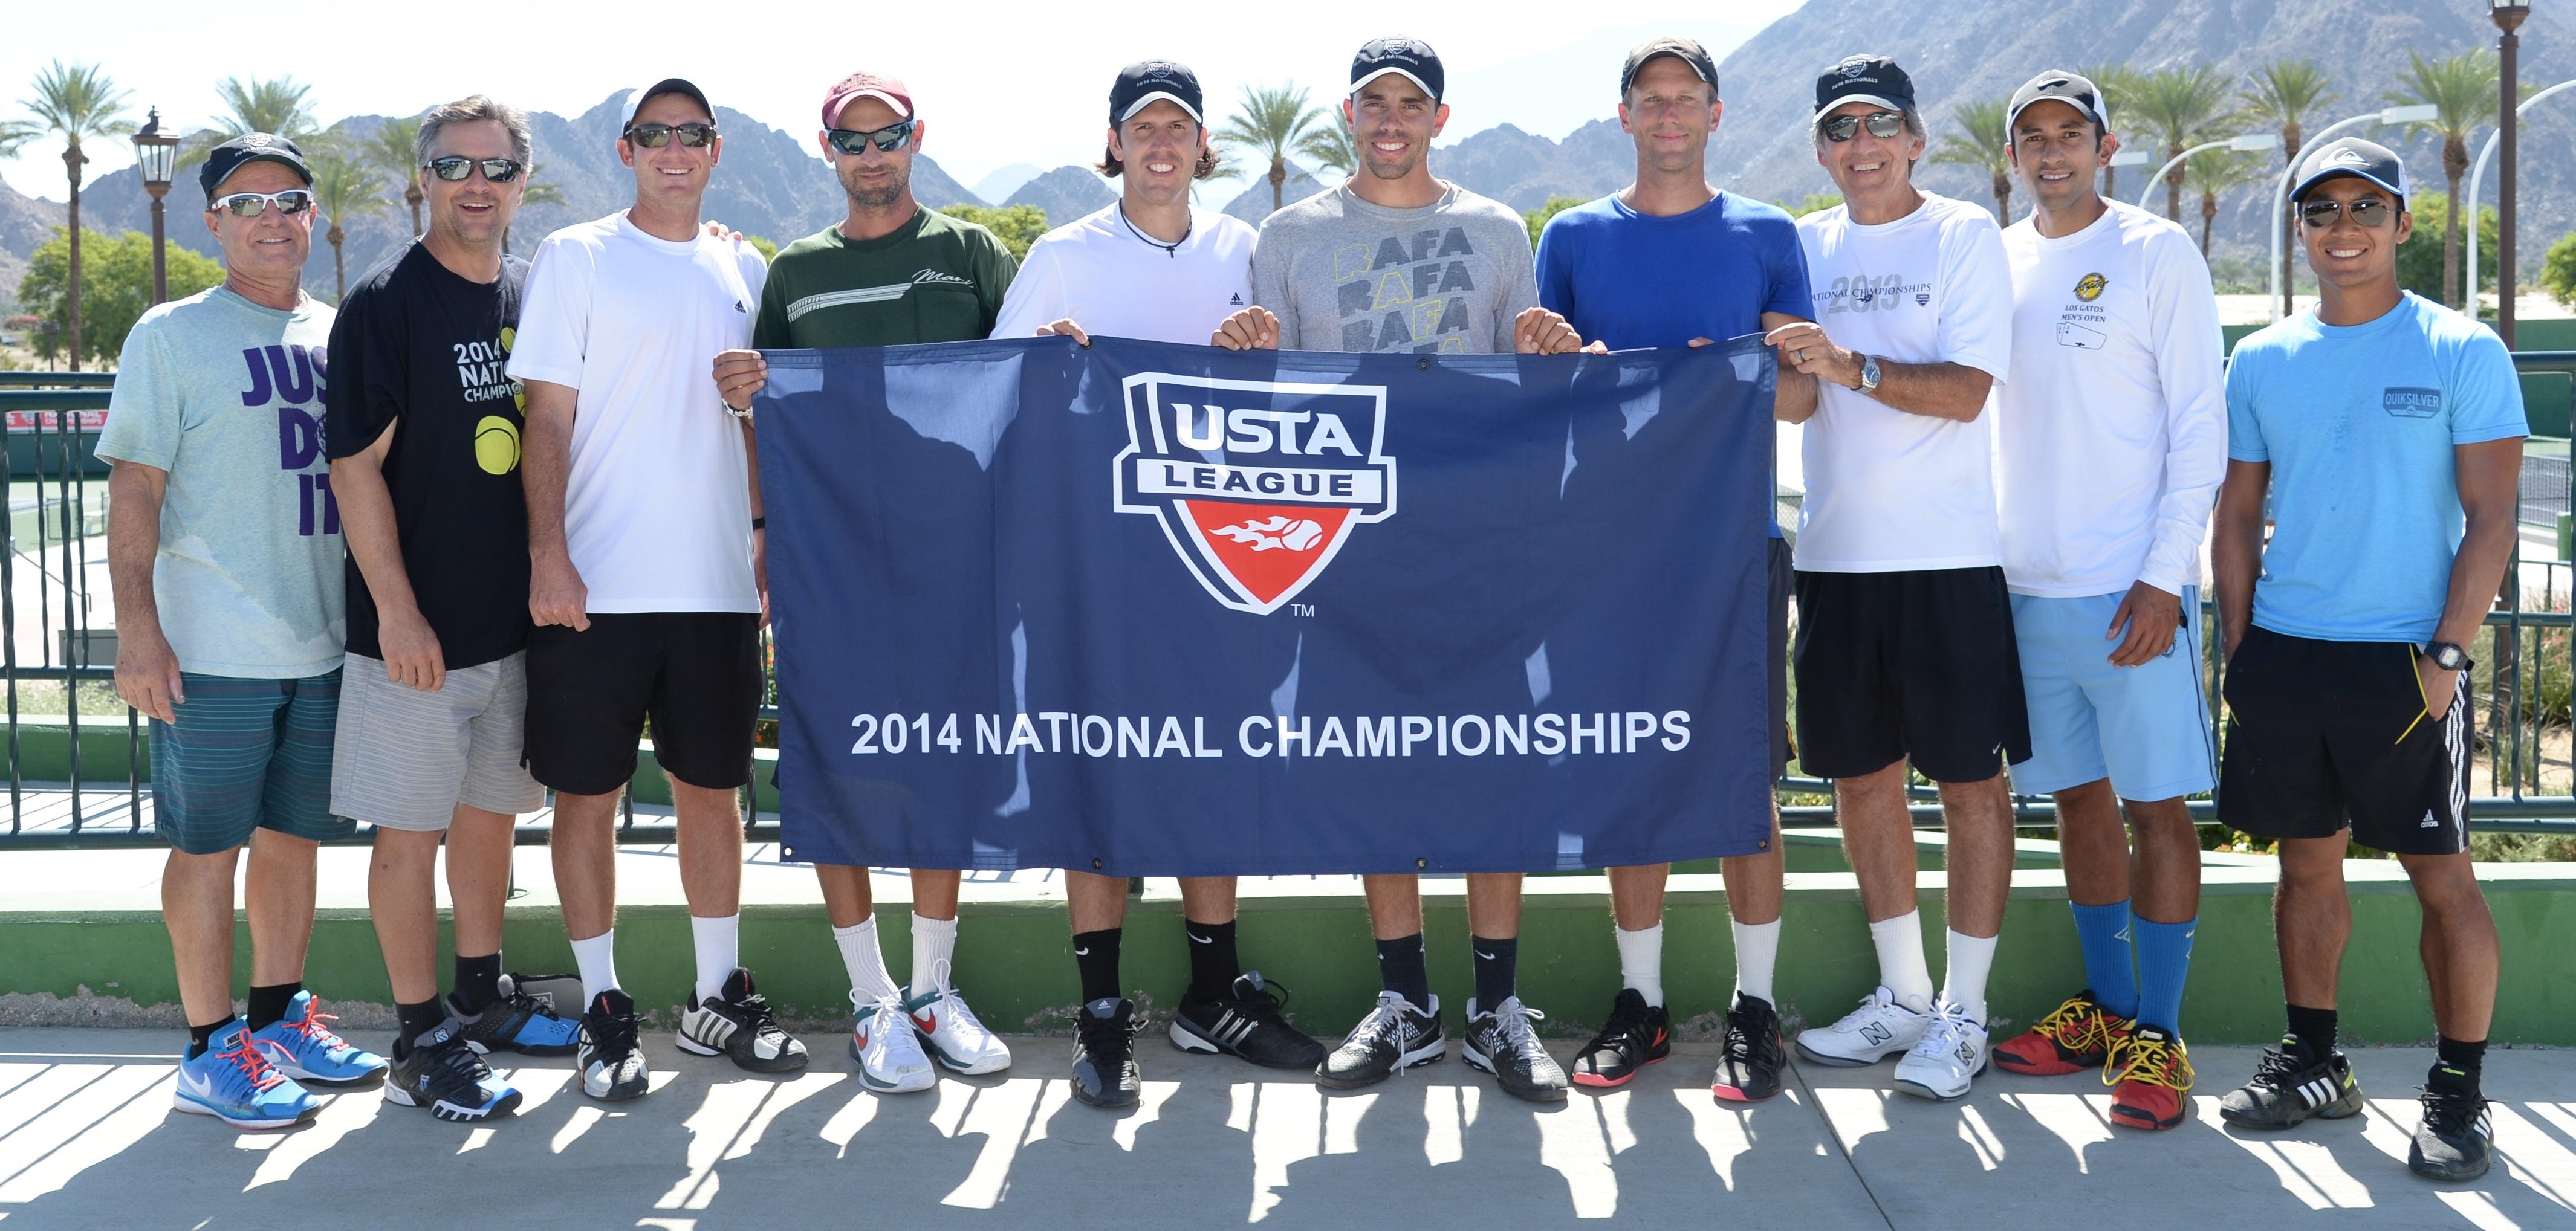 USTA 5.0+ Nationals 2014 Cropped.jpg